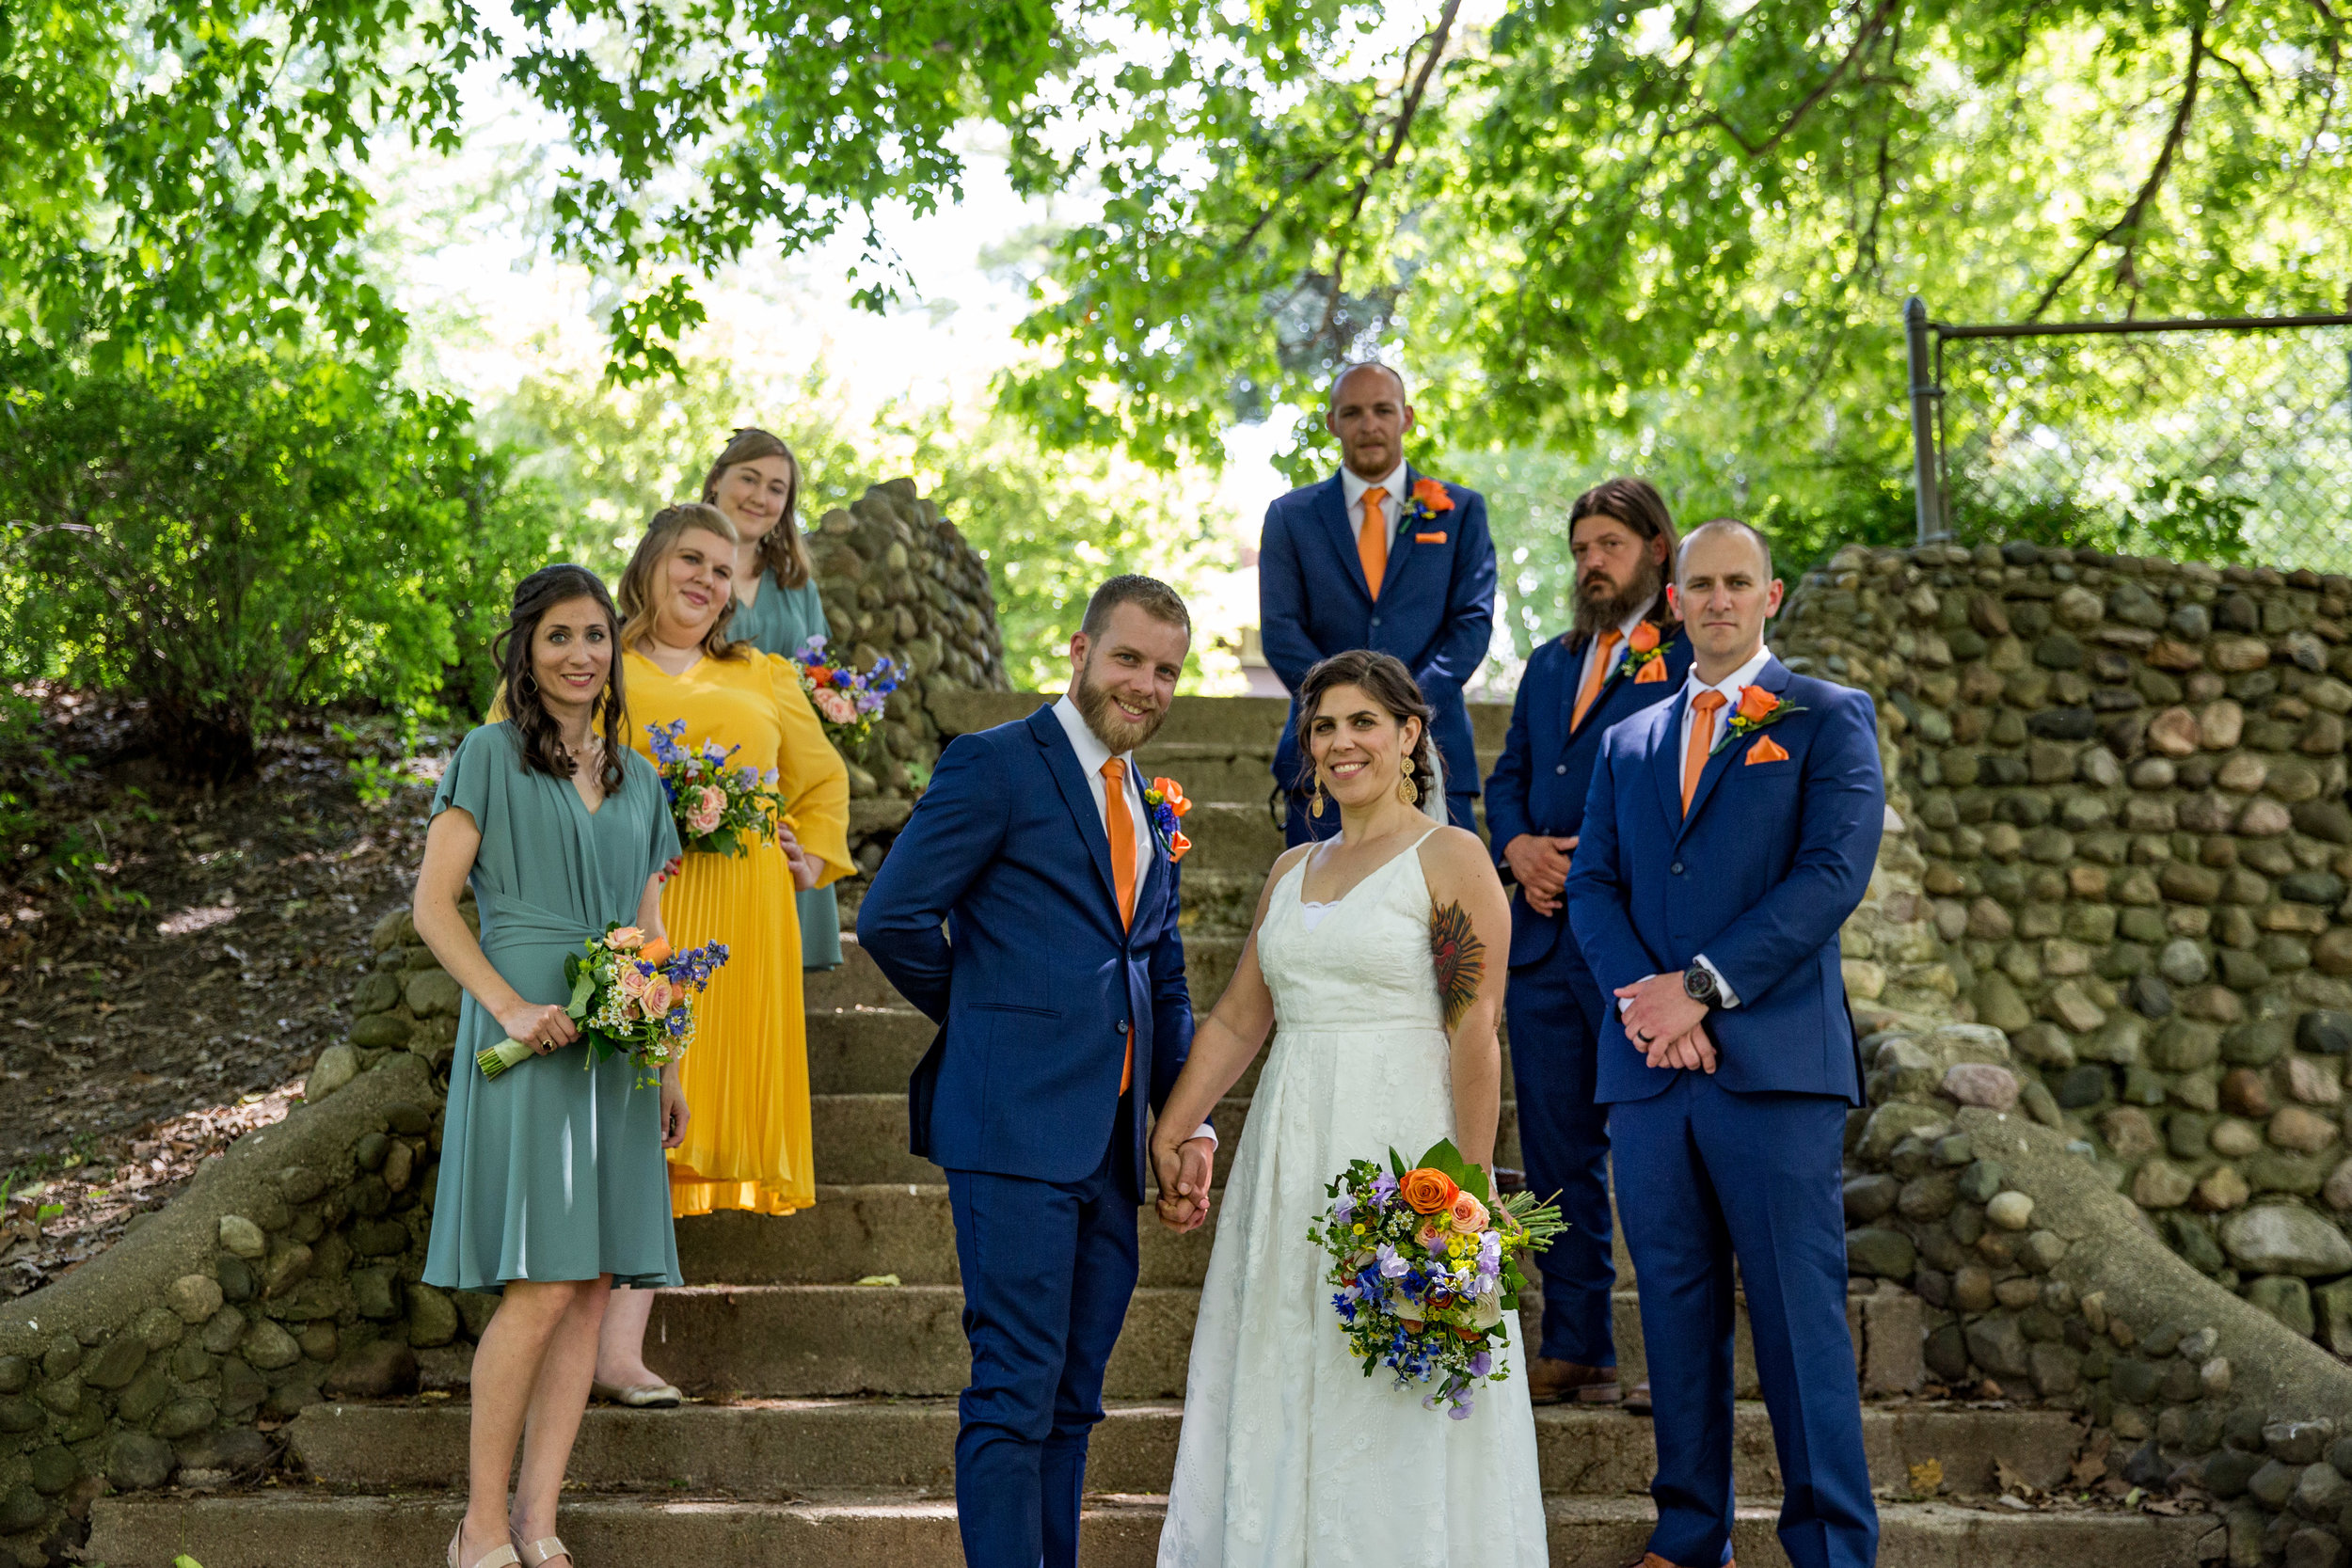 Natalie and Dallas Mooney Wedding 6-8-19_Tania Watt Photography-296.jpg